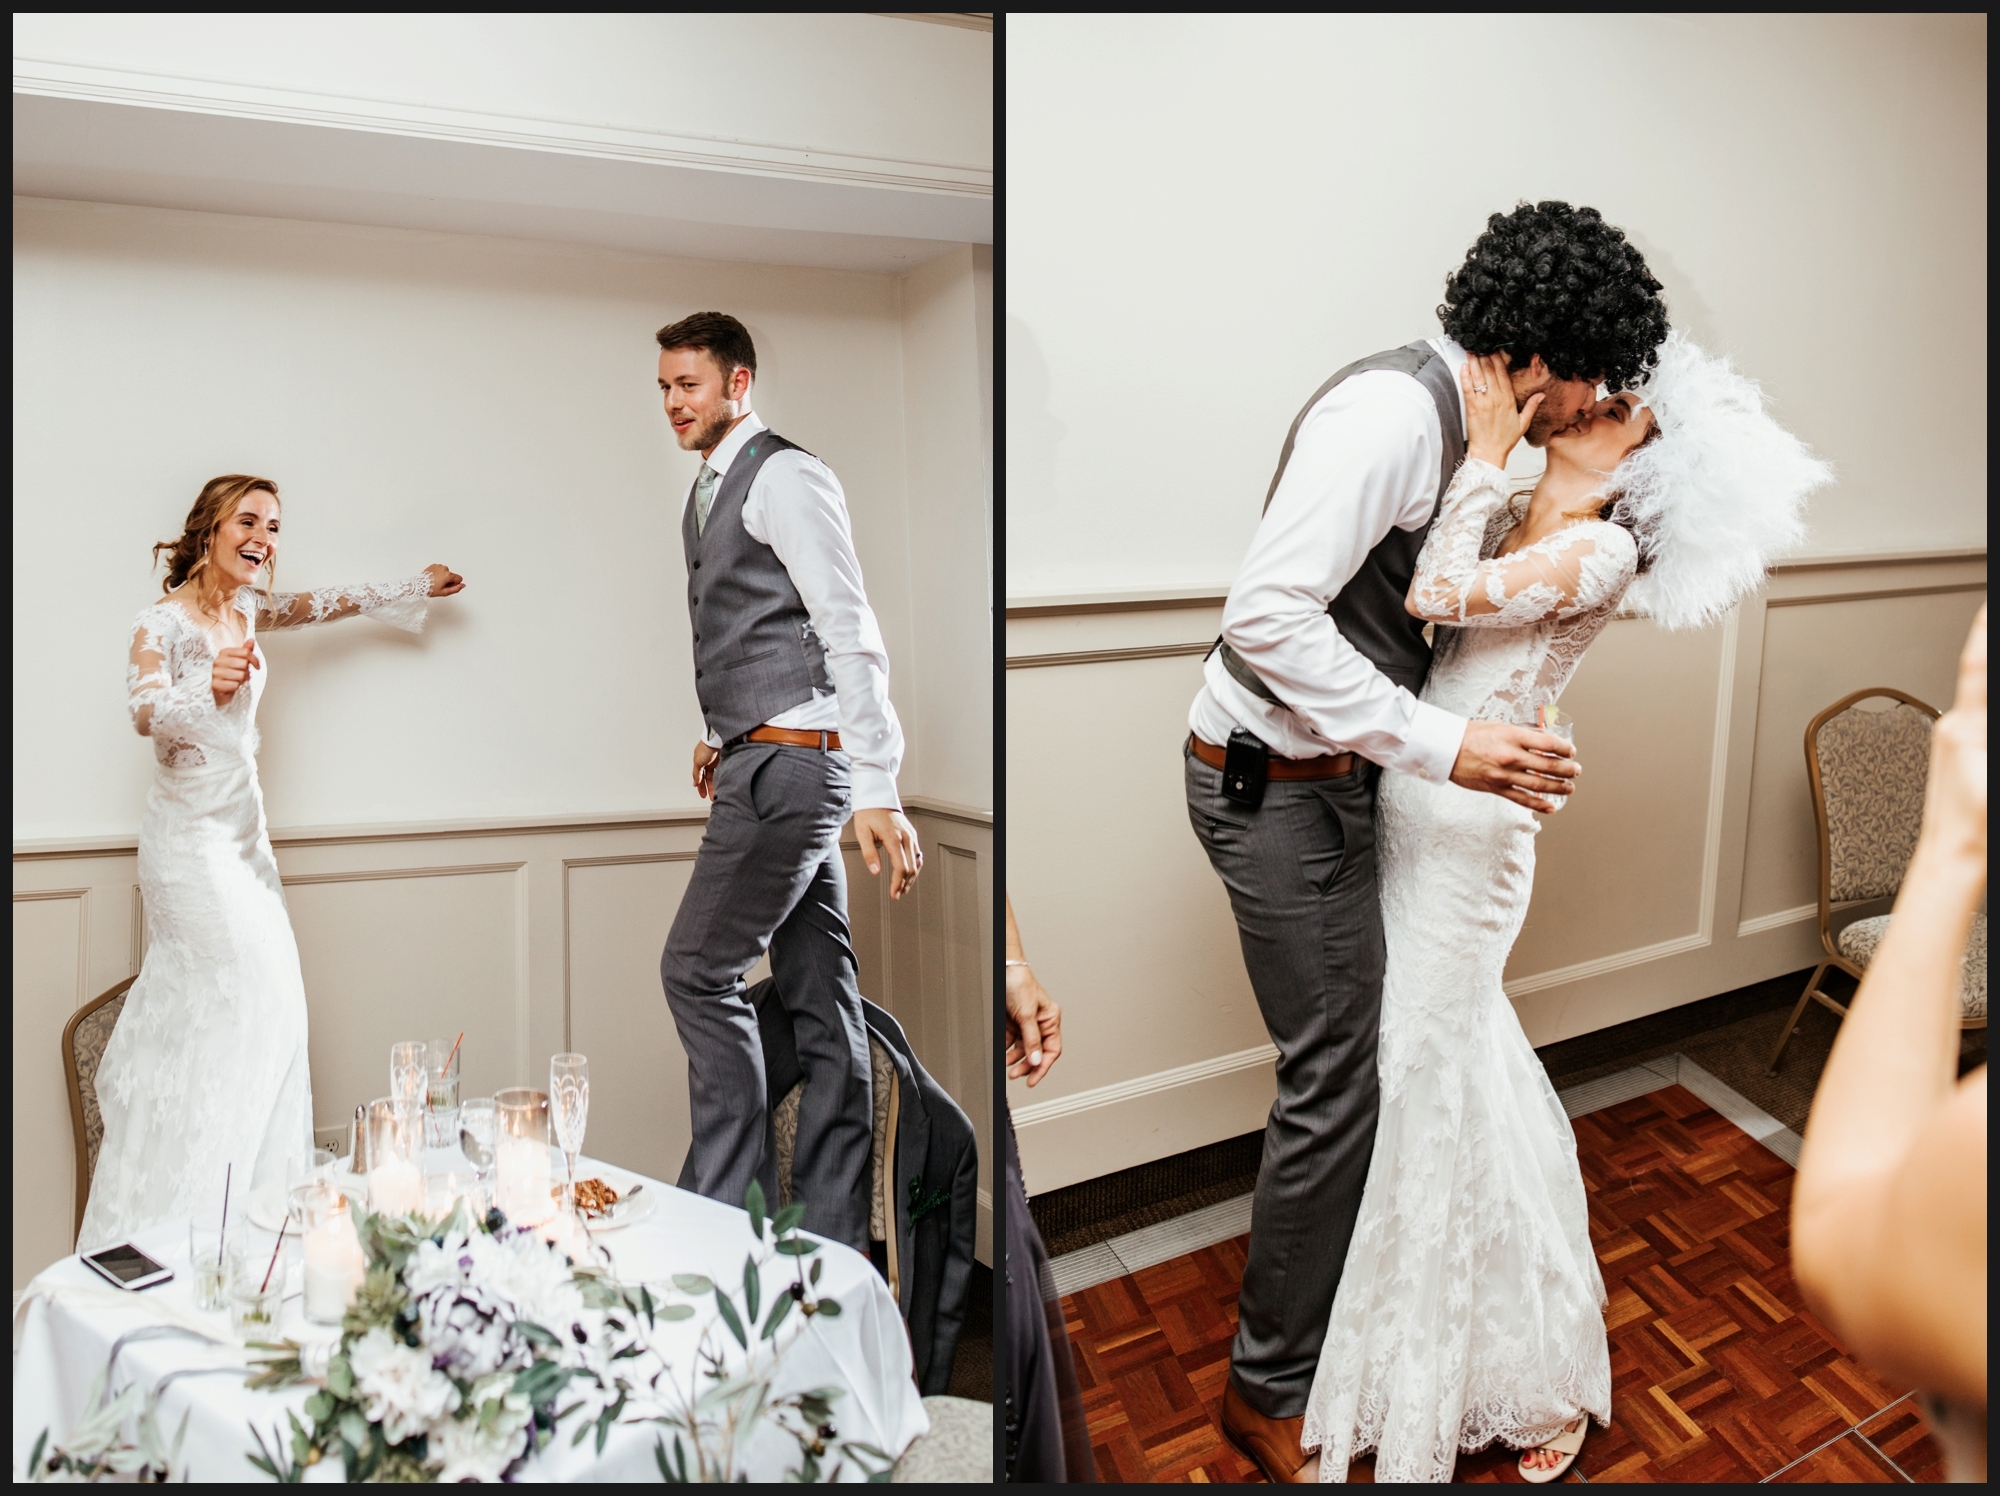 Orlando-Wedding-Photographer-destination-wedding-photographer-florida-wedding-photographer-hawaii-wedding-photographer_0112.jpg